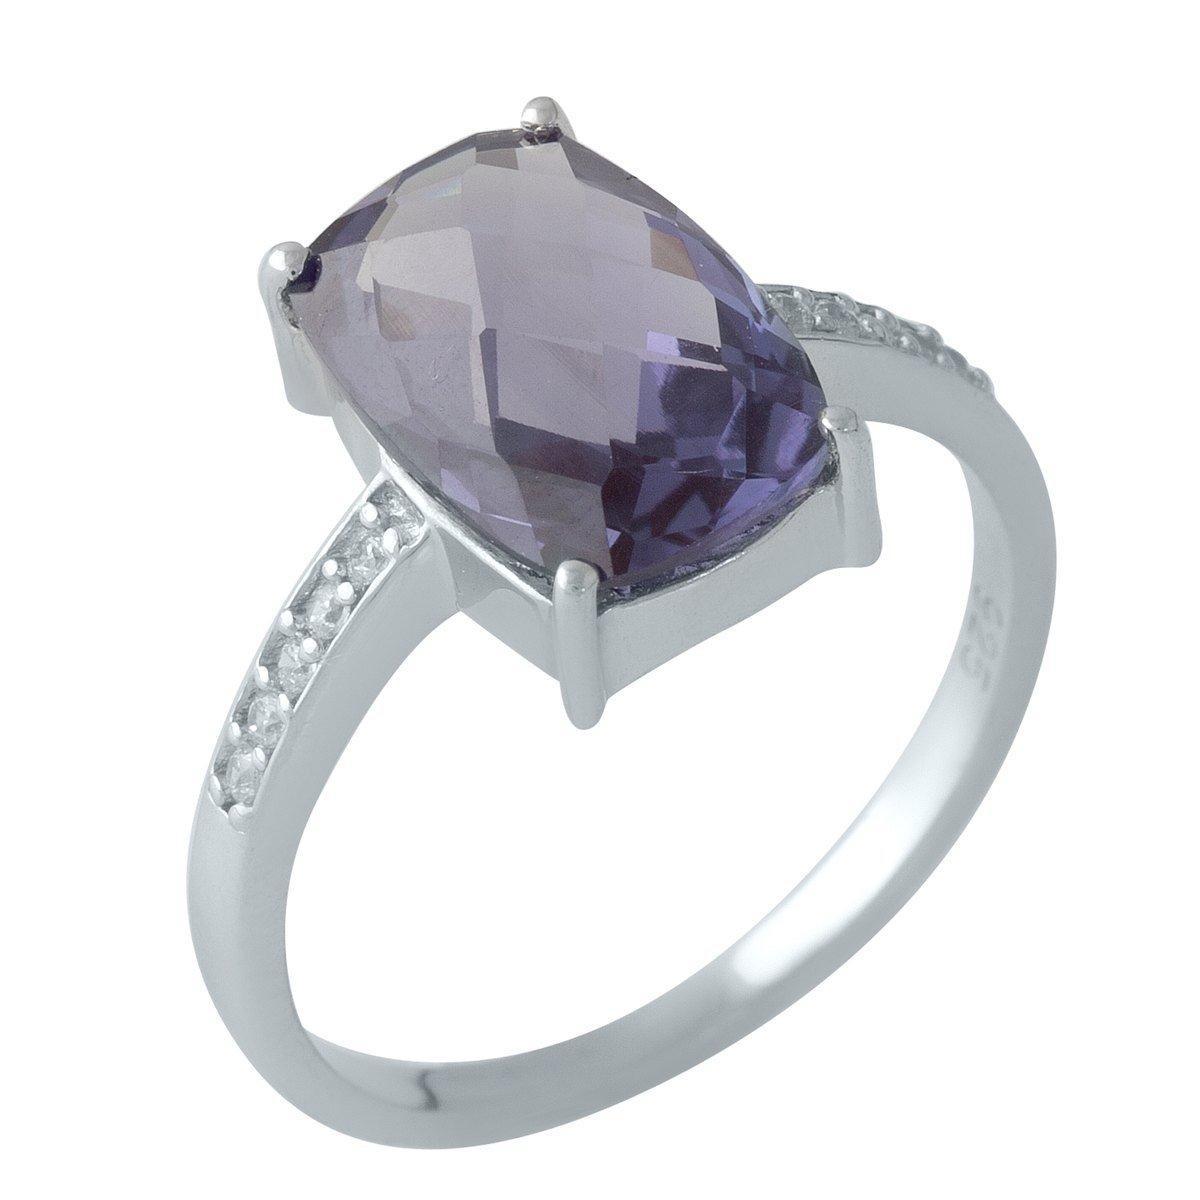 Серебряное кольцо DreamJewelry с олександритом 4.83ct (1131985) 17.5 размер